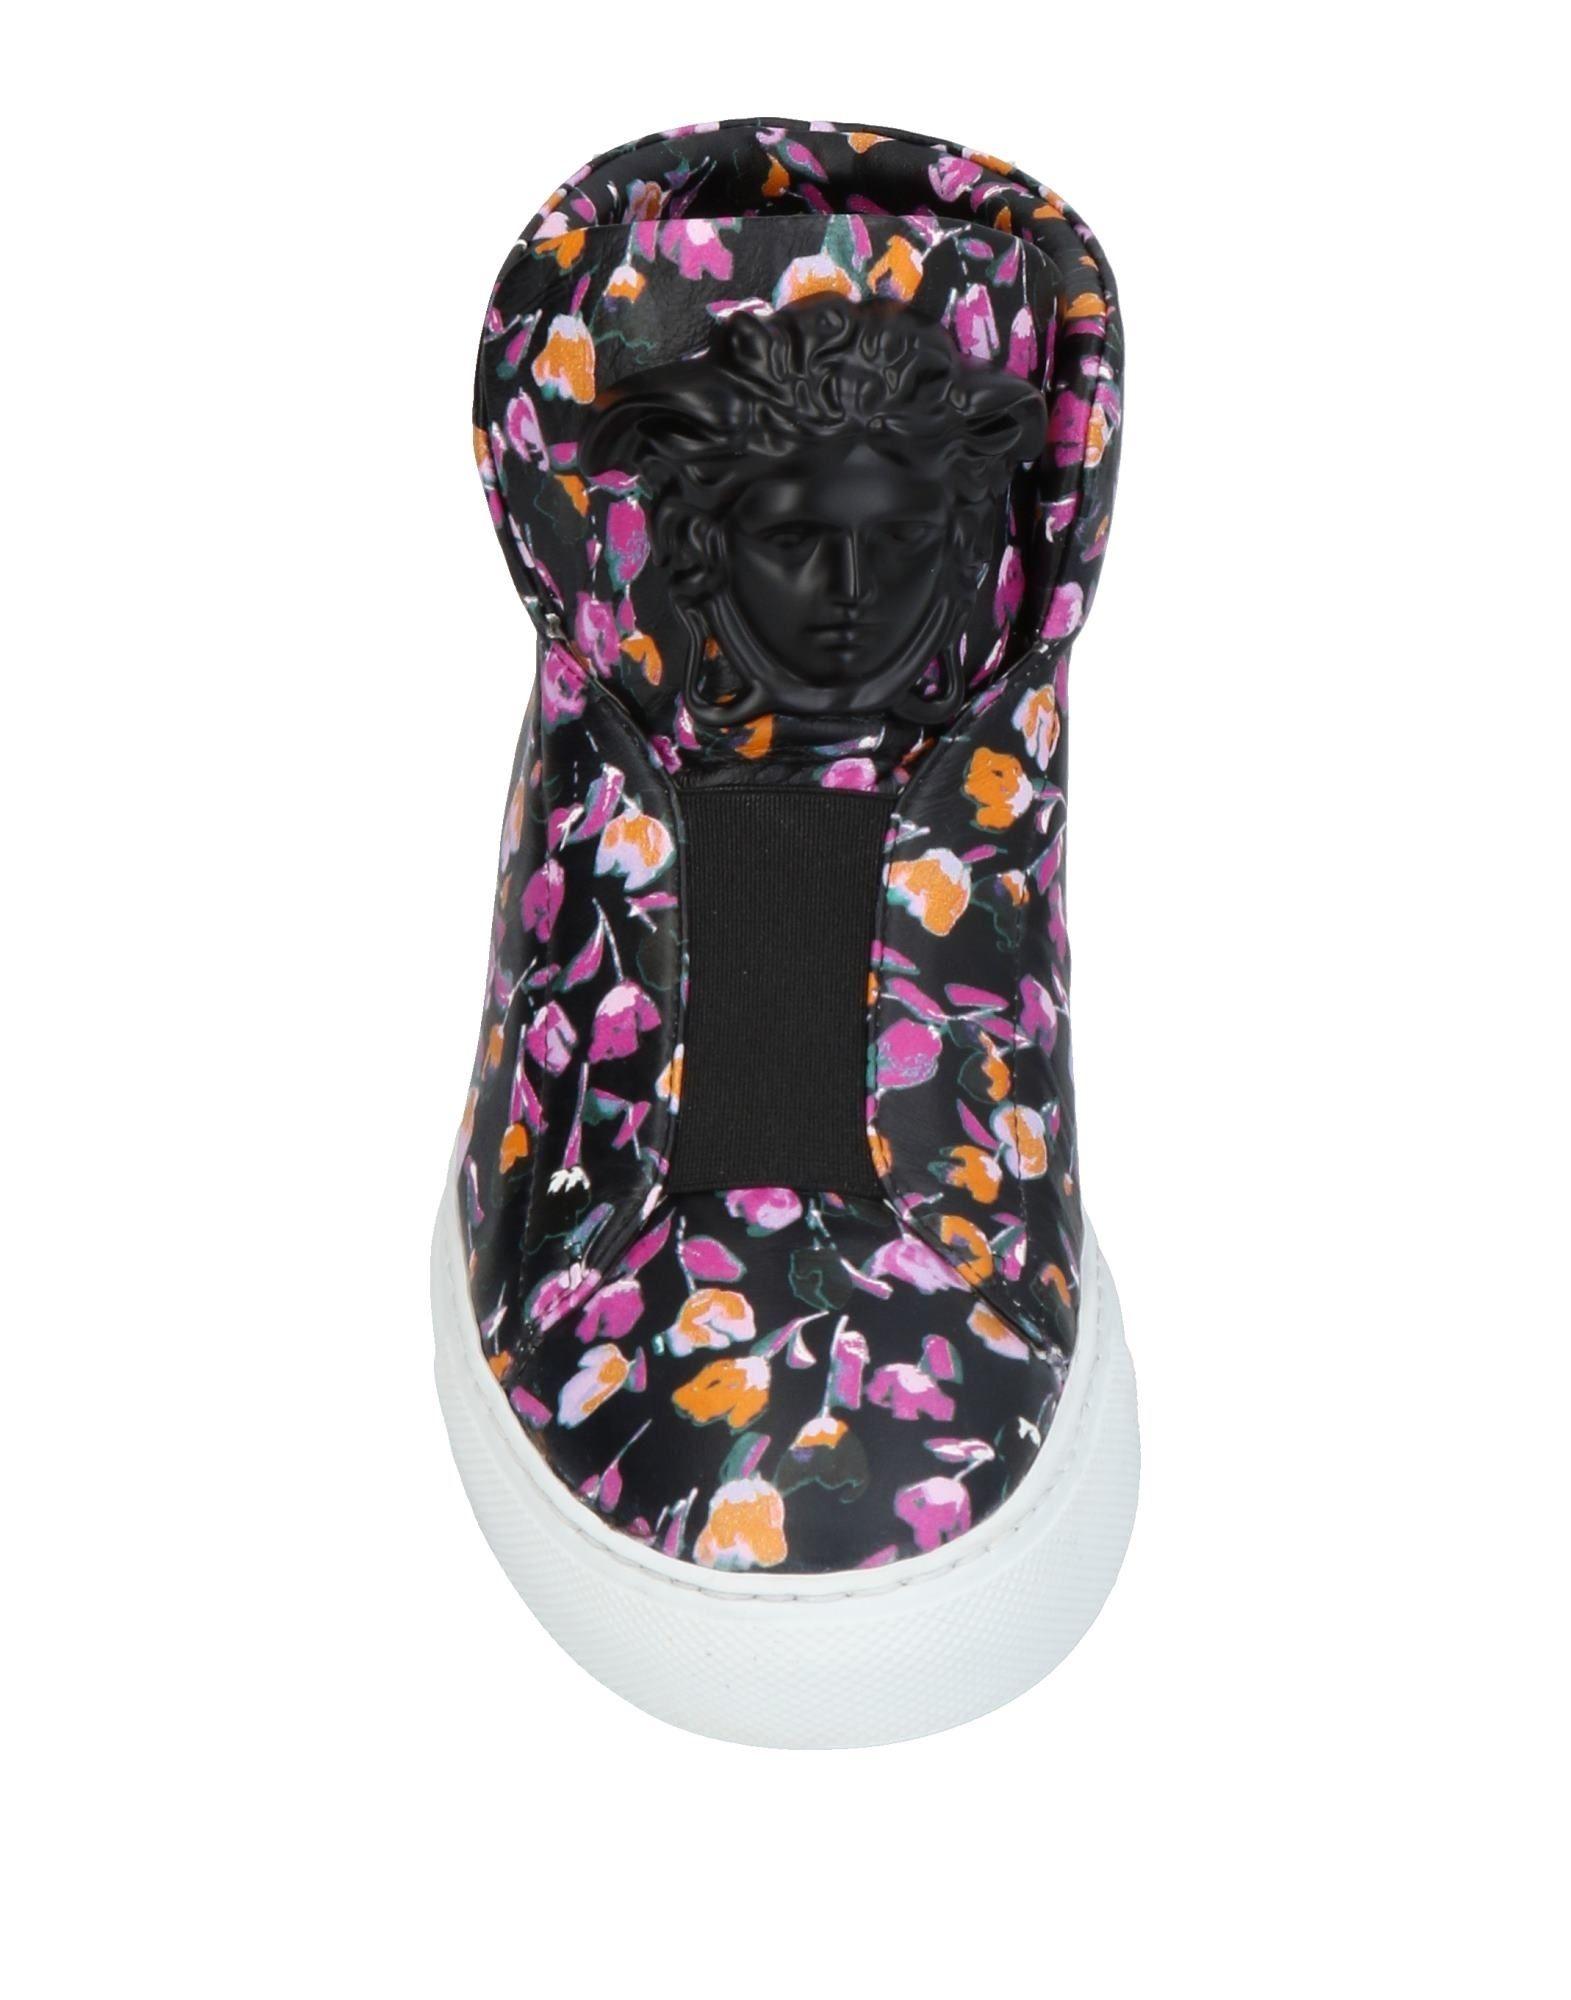 Versace 11442641EH Sneakers Damen  11442641EH Versace Heiße Schuhe 6f9e12